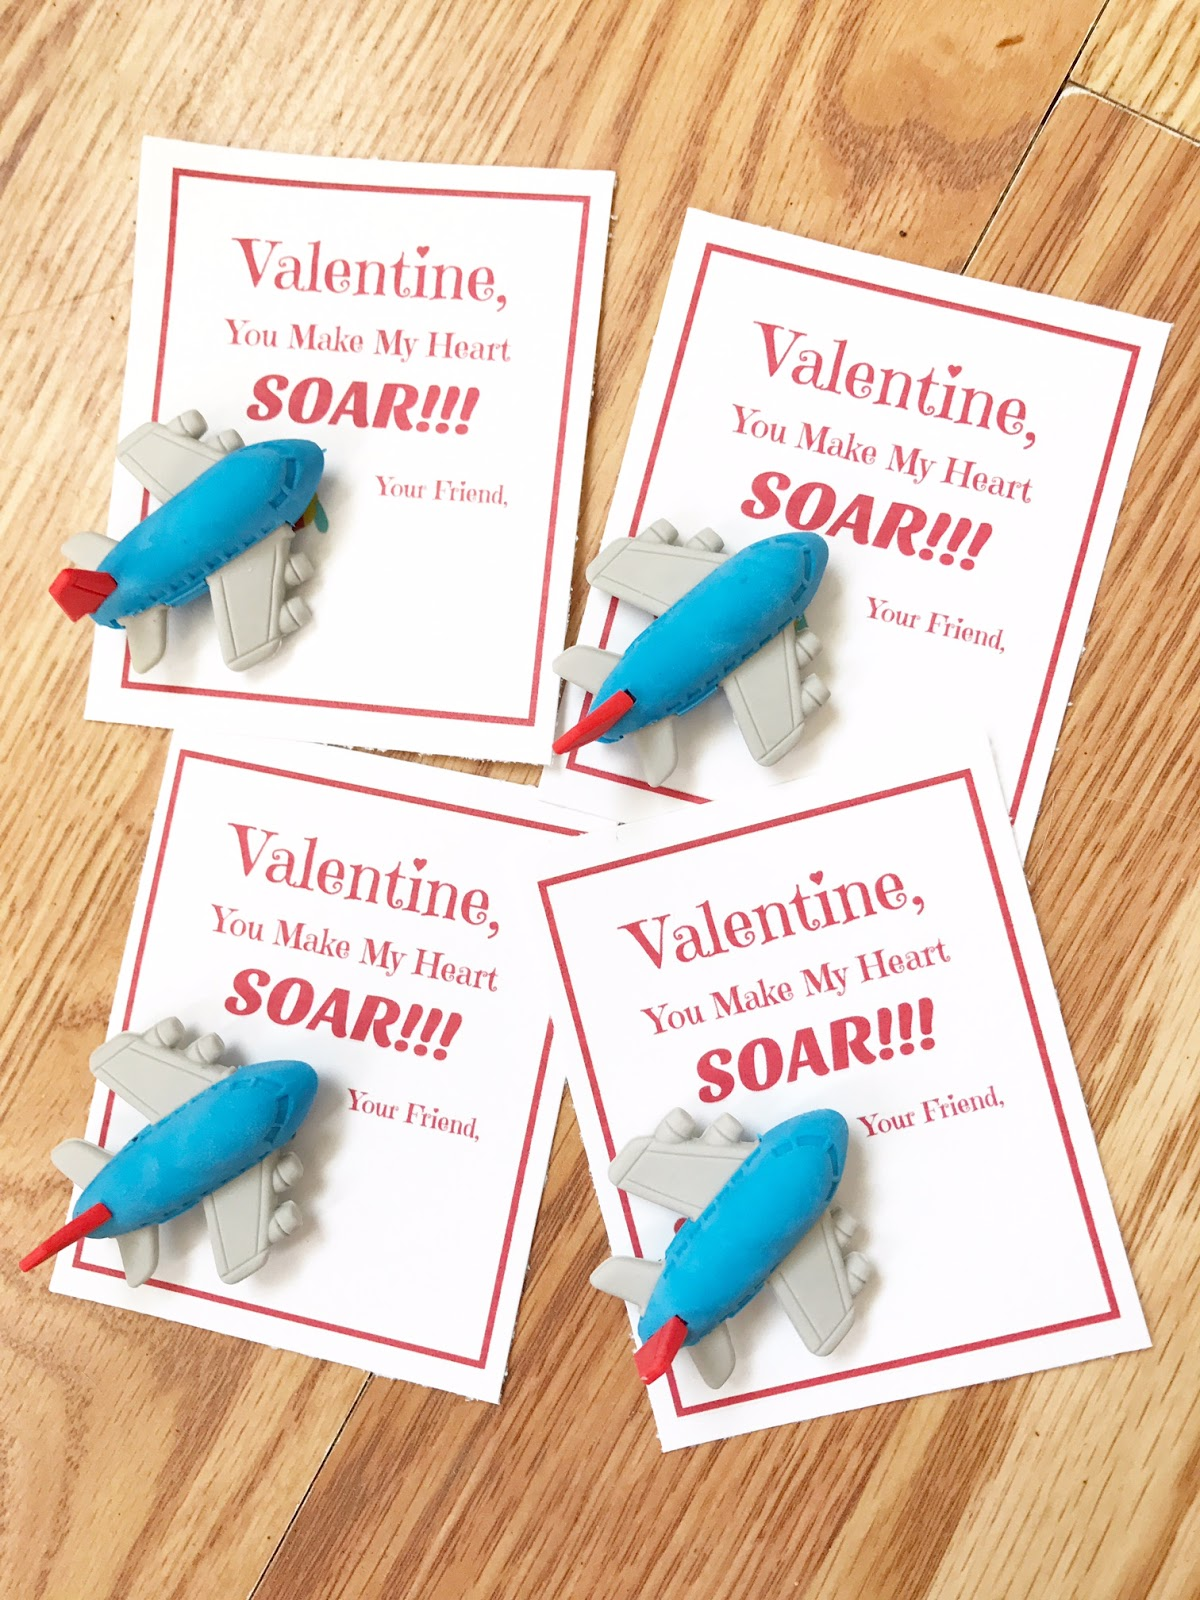 Valentine You Make My Heart Soar Free Printable